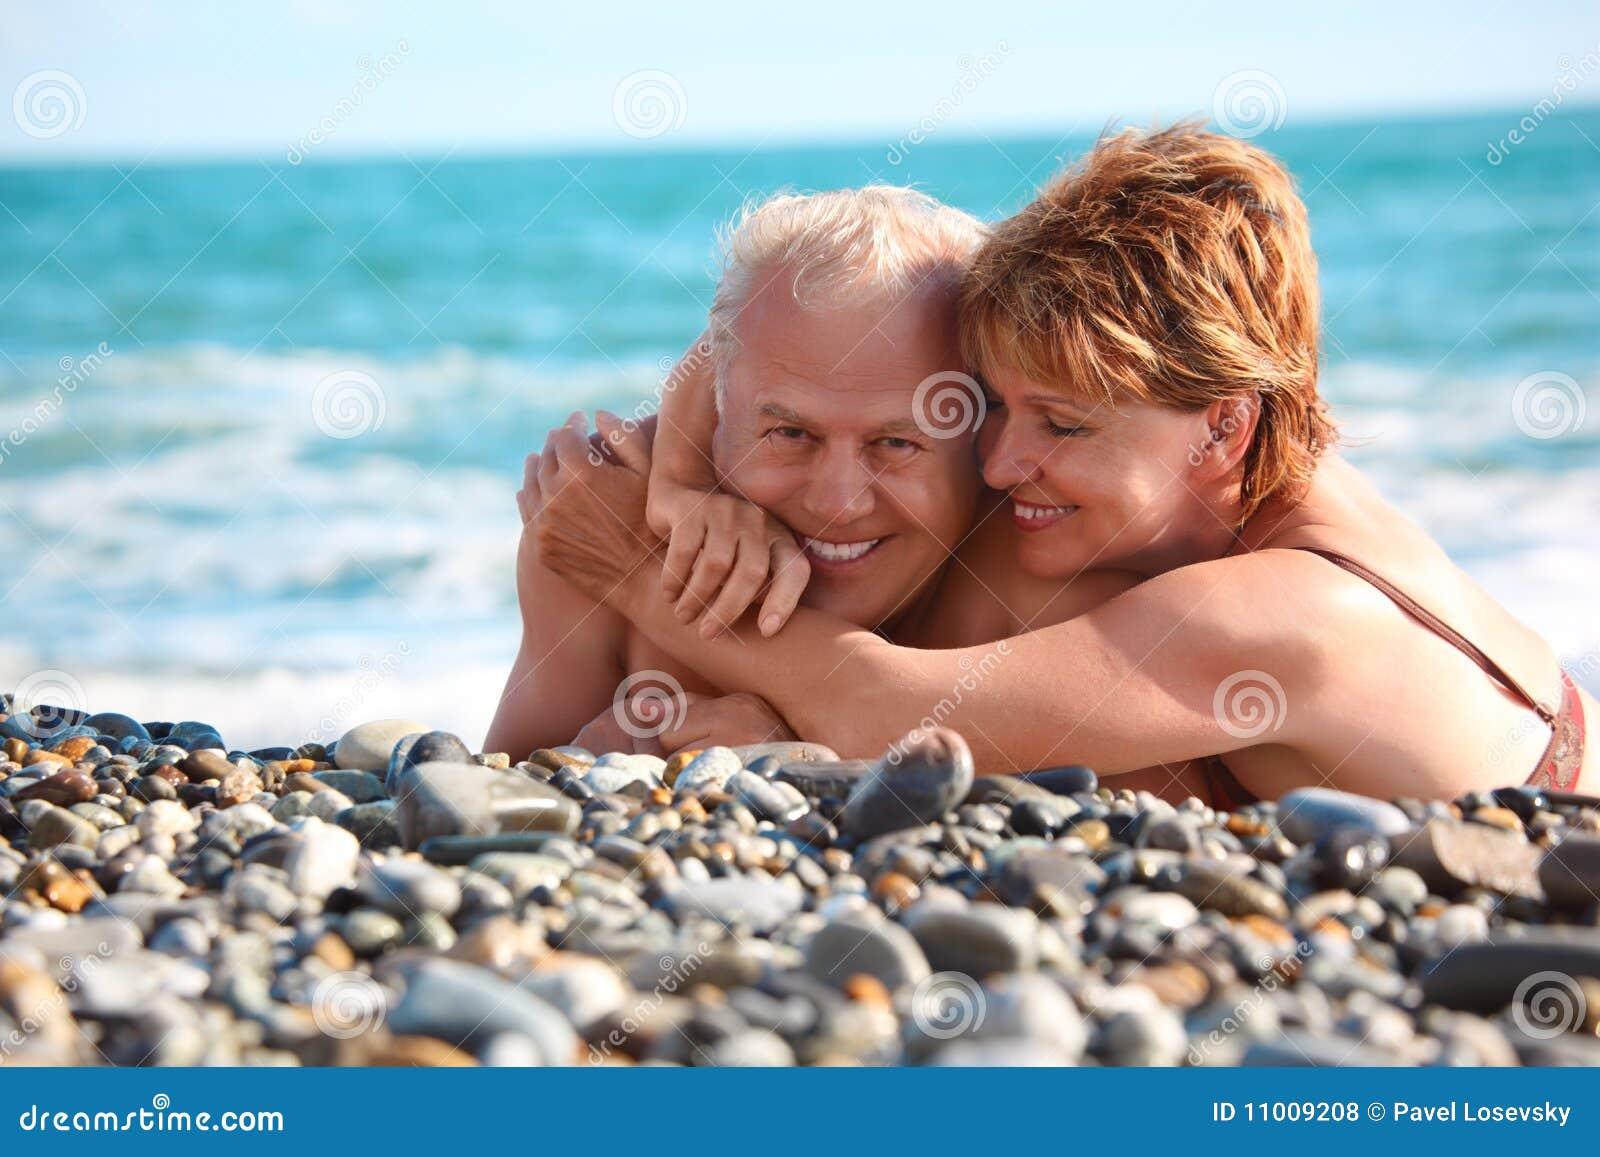 Фото семейной пары на отдыхе секс, Секс на пляже частное фото семейных пар 20 фотография